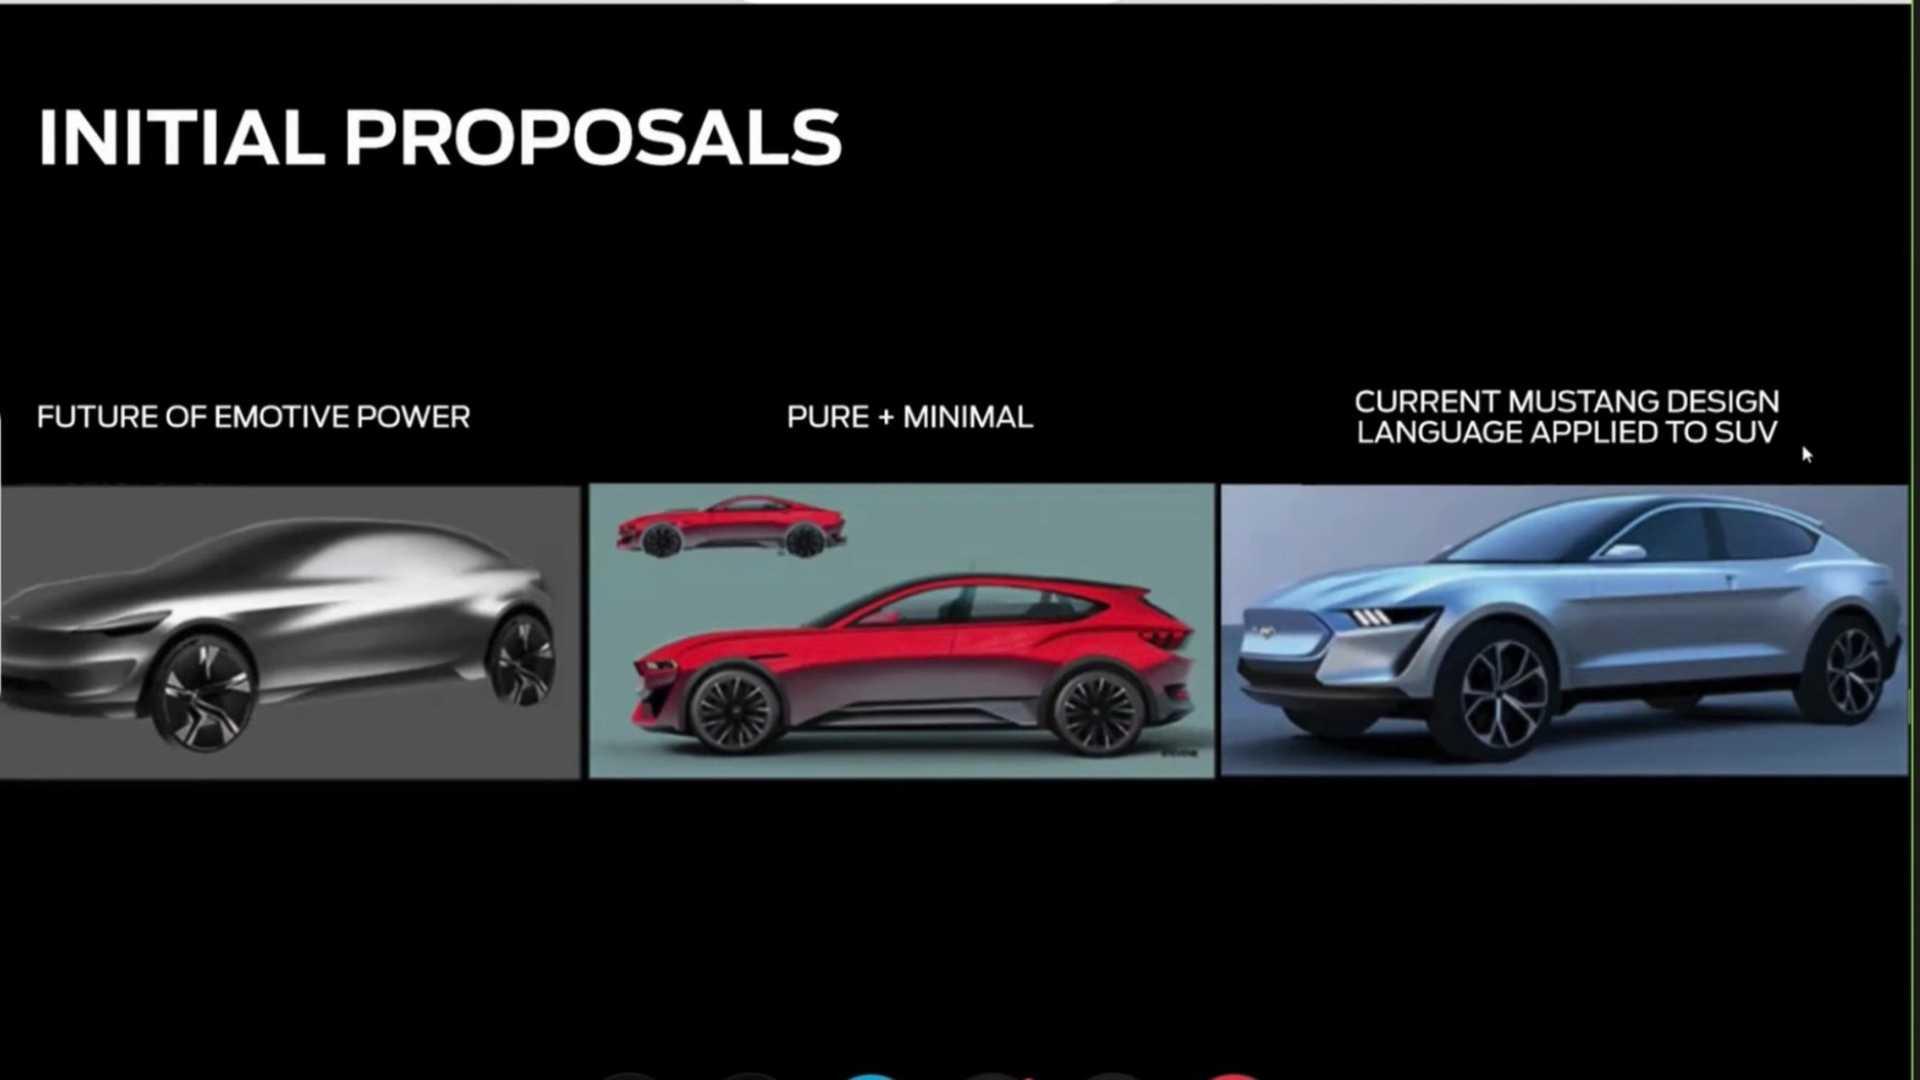 Ford-Mustang-Mach-E-Design-Process-Presentation-6